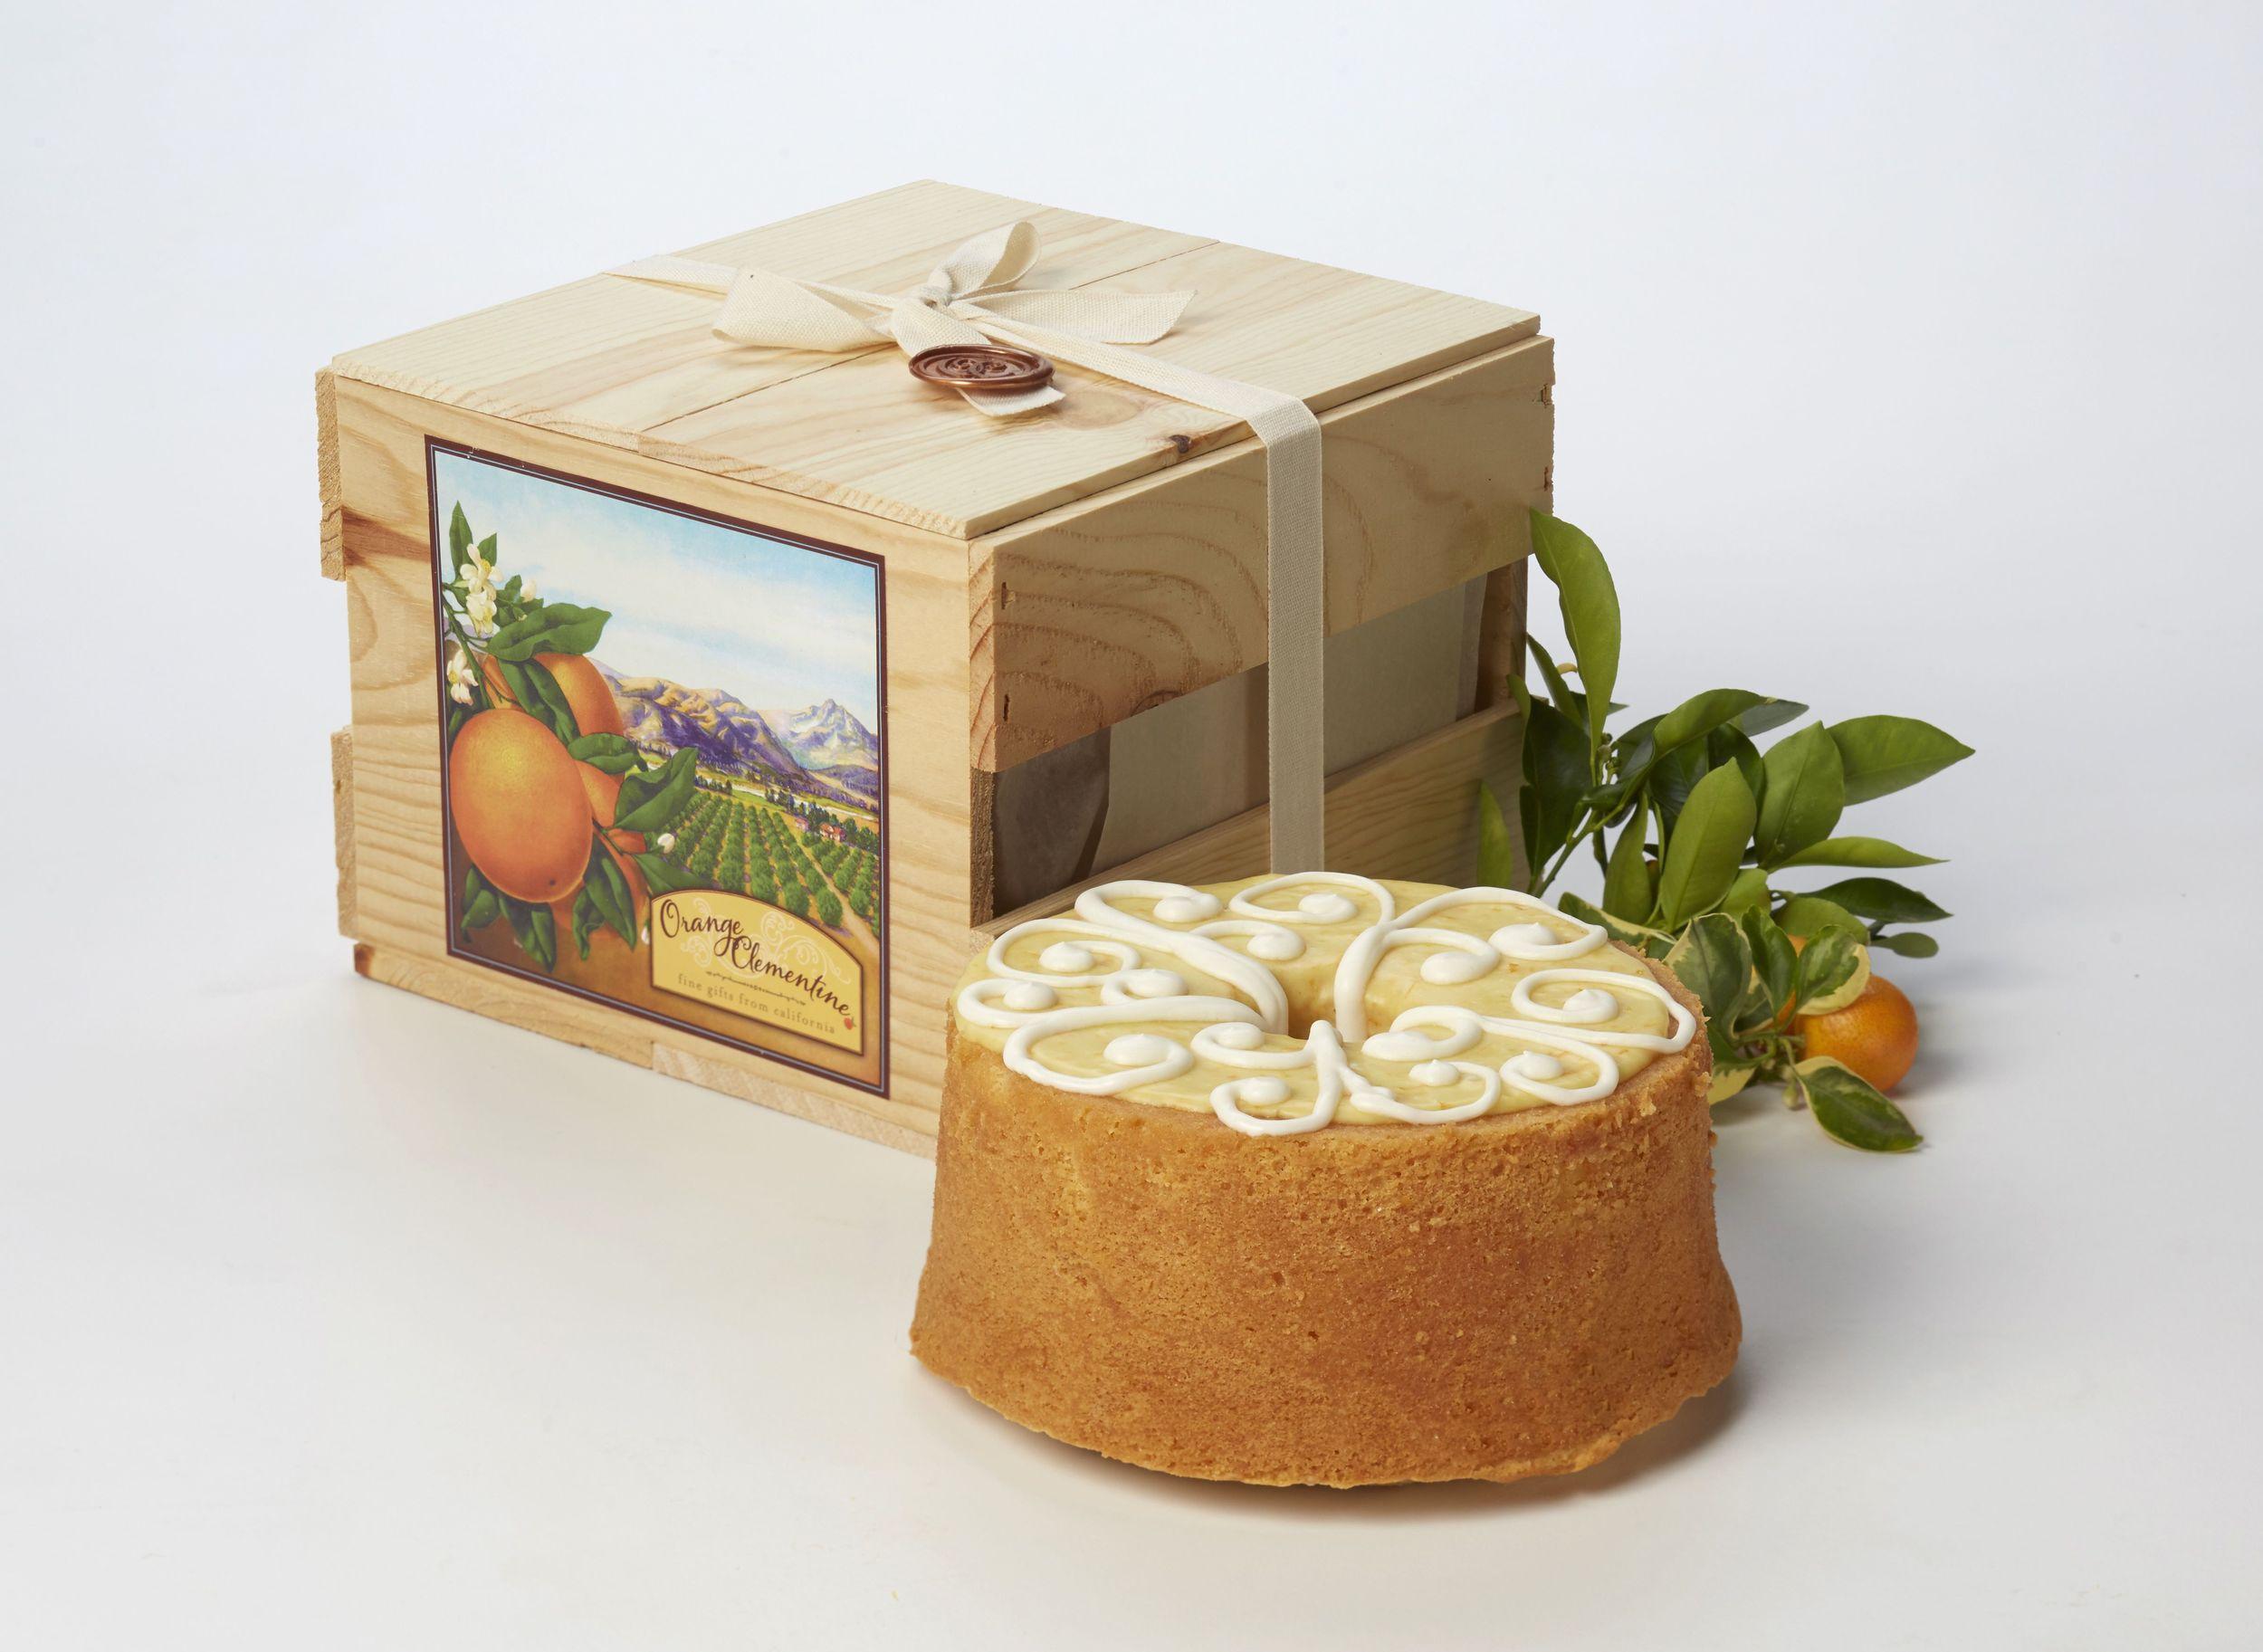 sqa box product 5683.jpg